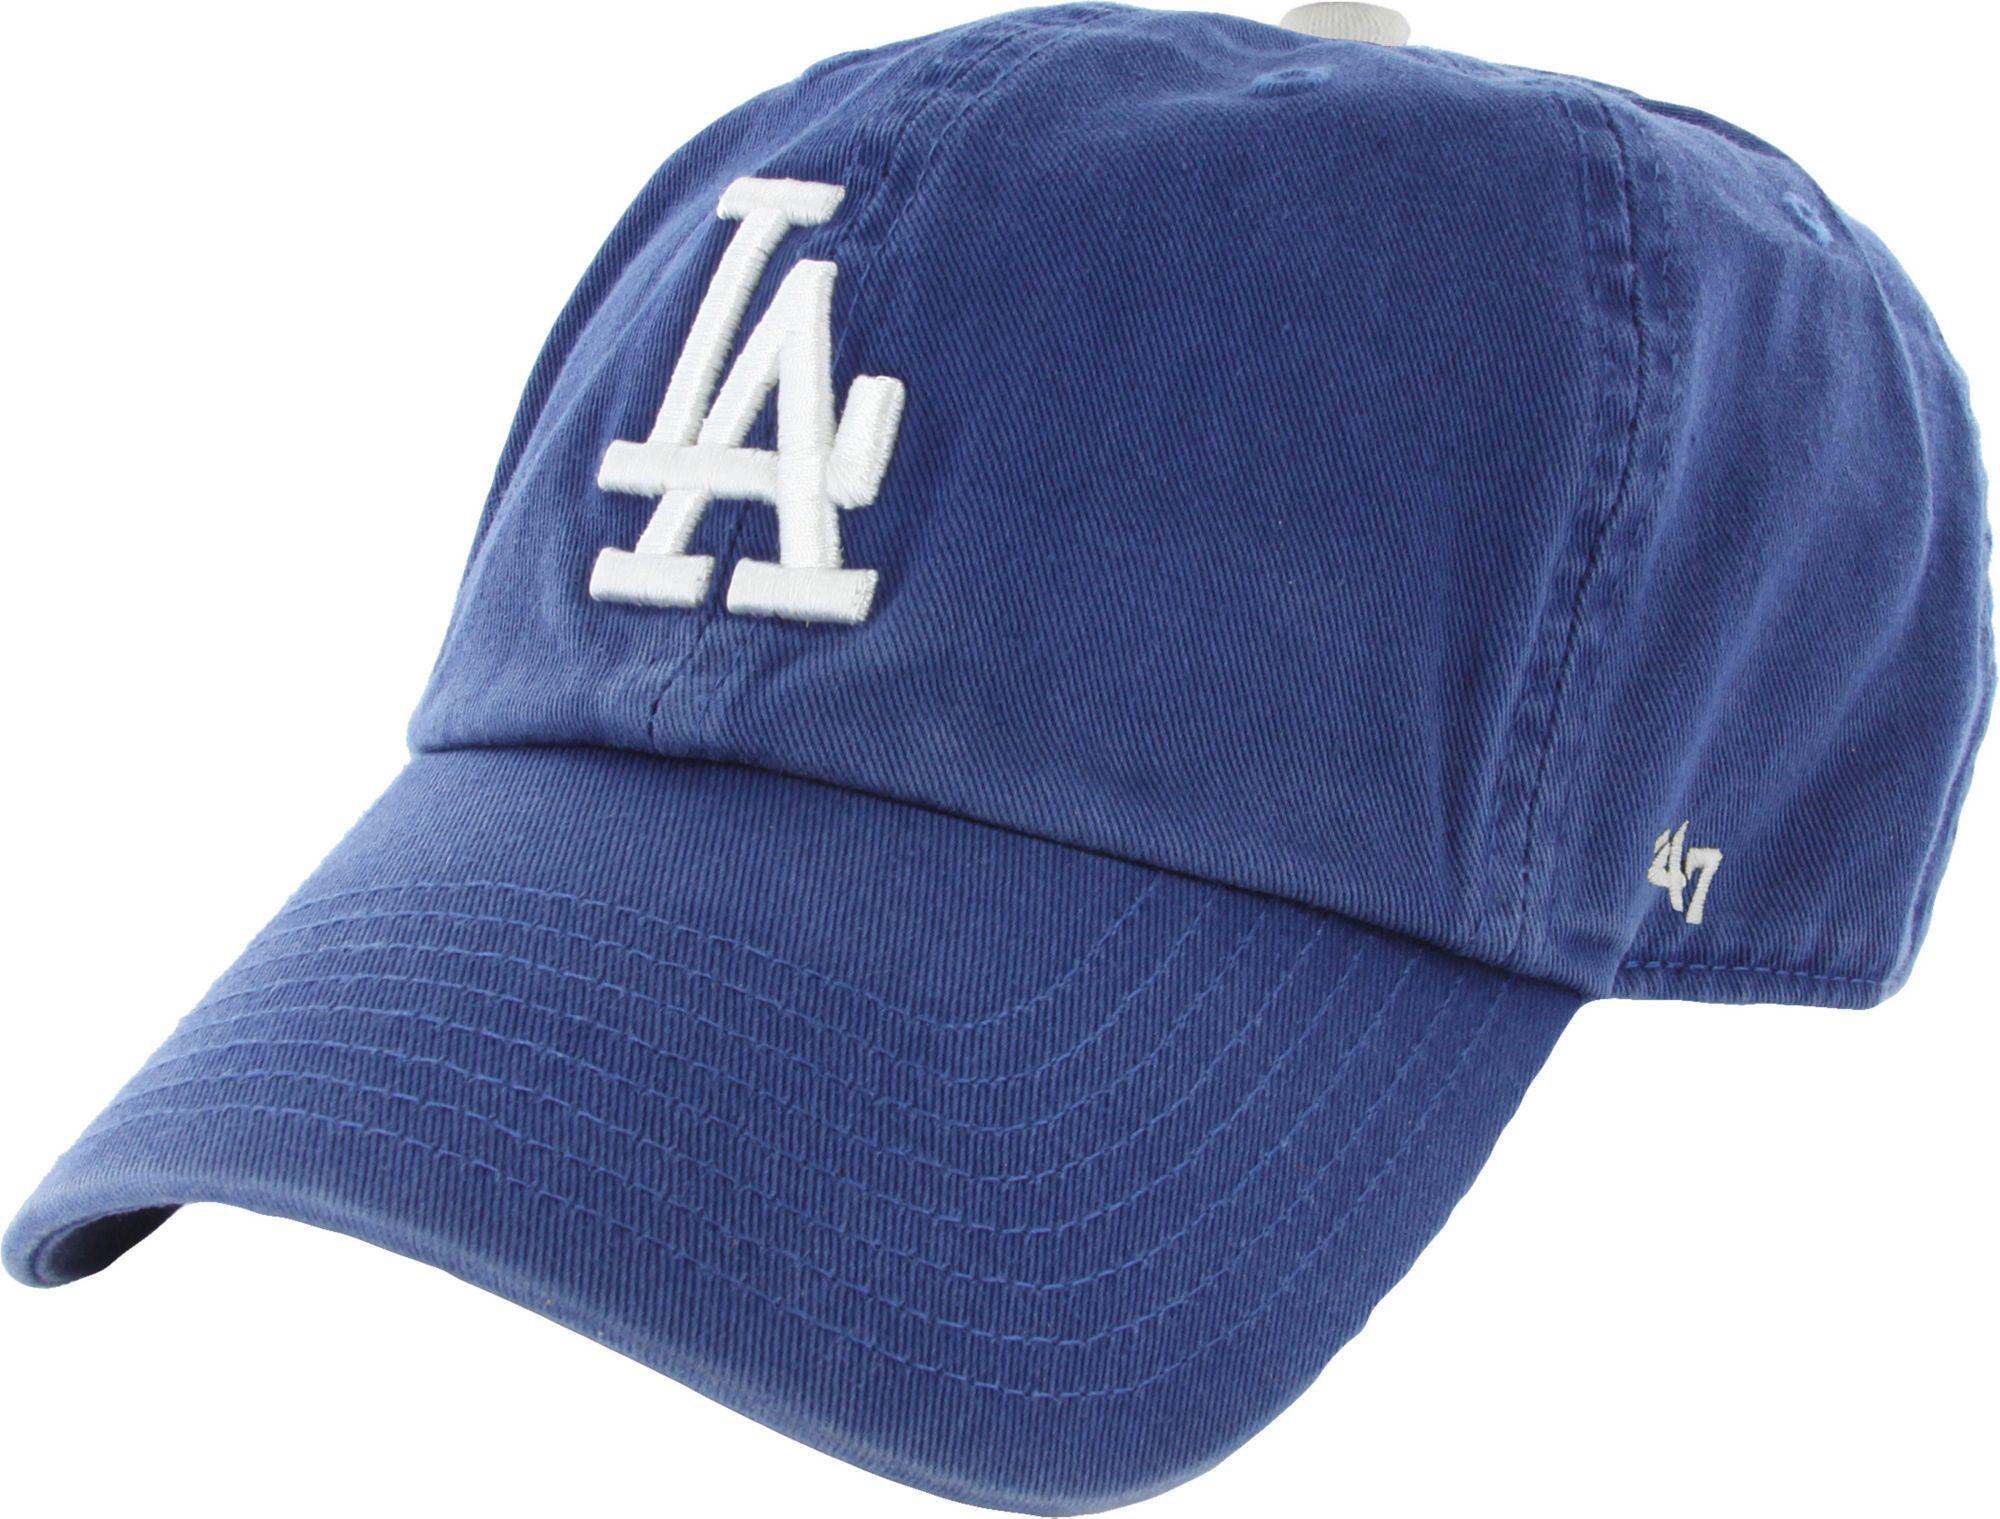 buy online b91ee a49fb ... get 47 mens los angeles dodgers royal clean up adjustable hat 897ab  f26e8